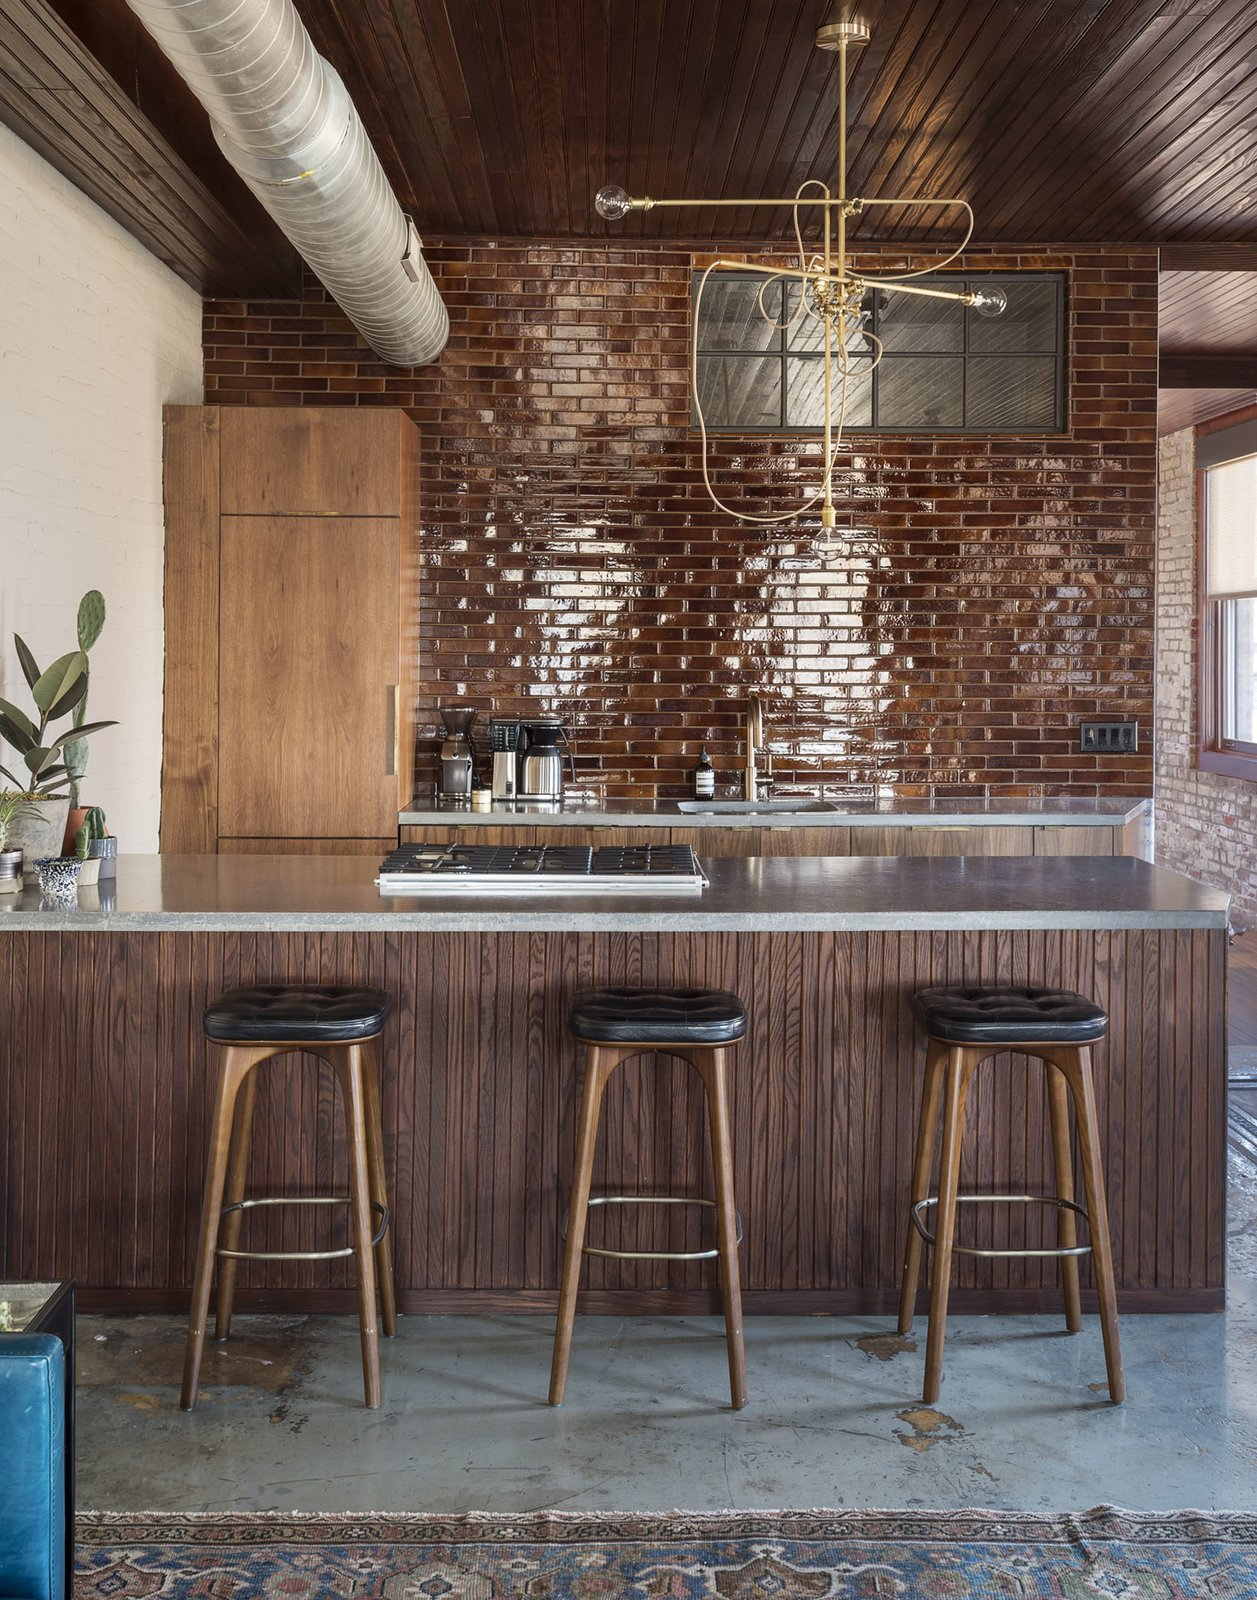 Kitchen, Granite Counter, Wood Cabinet, Concrete Floor, Refrigerator, Ceramic Tile Backsplashe, and Pendant Lighting  Mulherin's Hotel